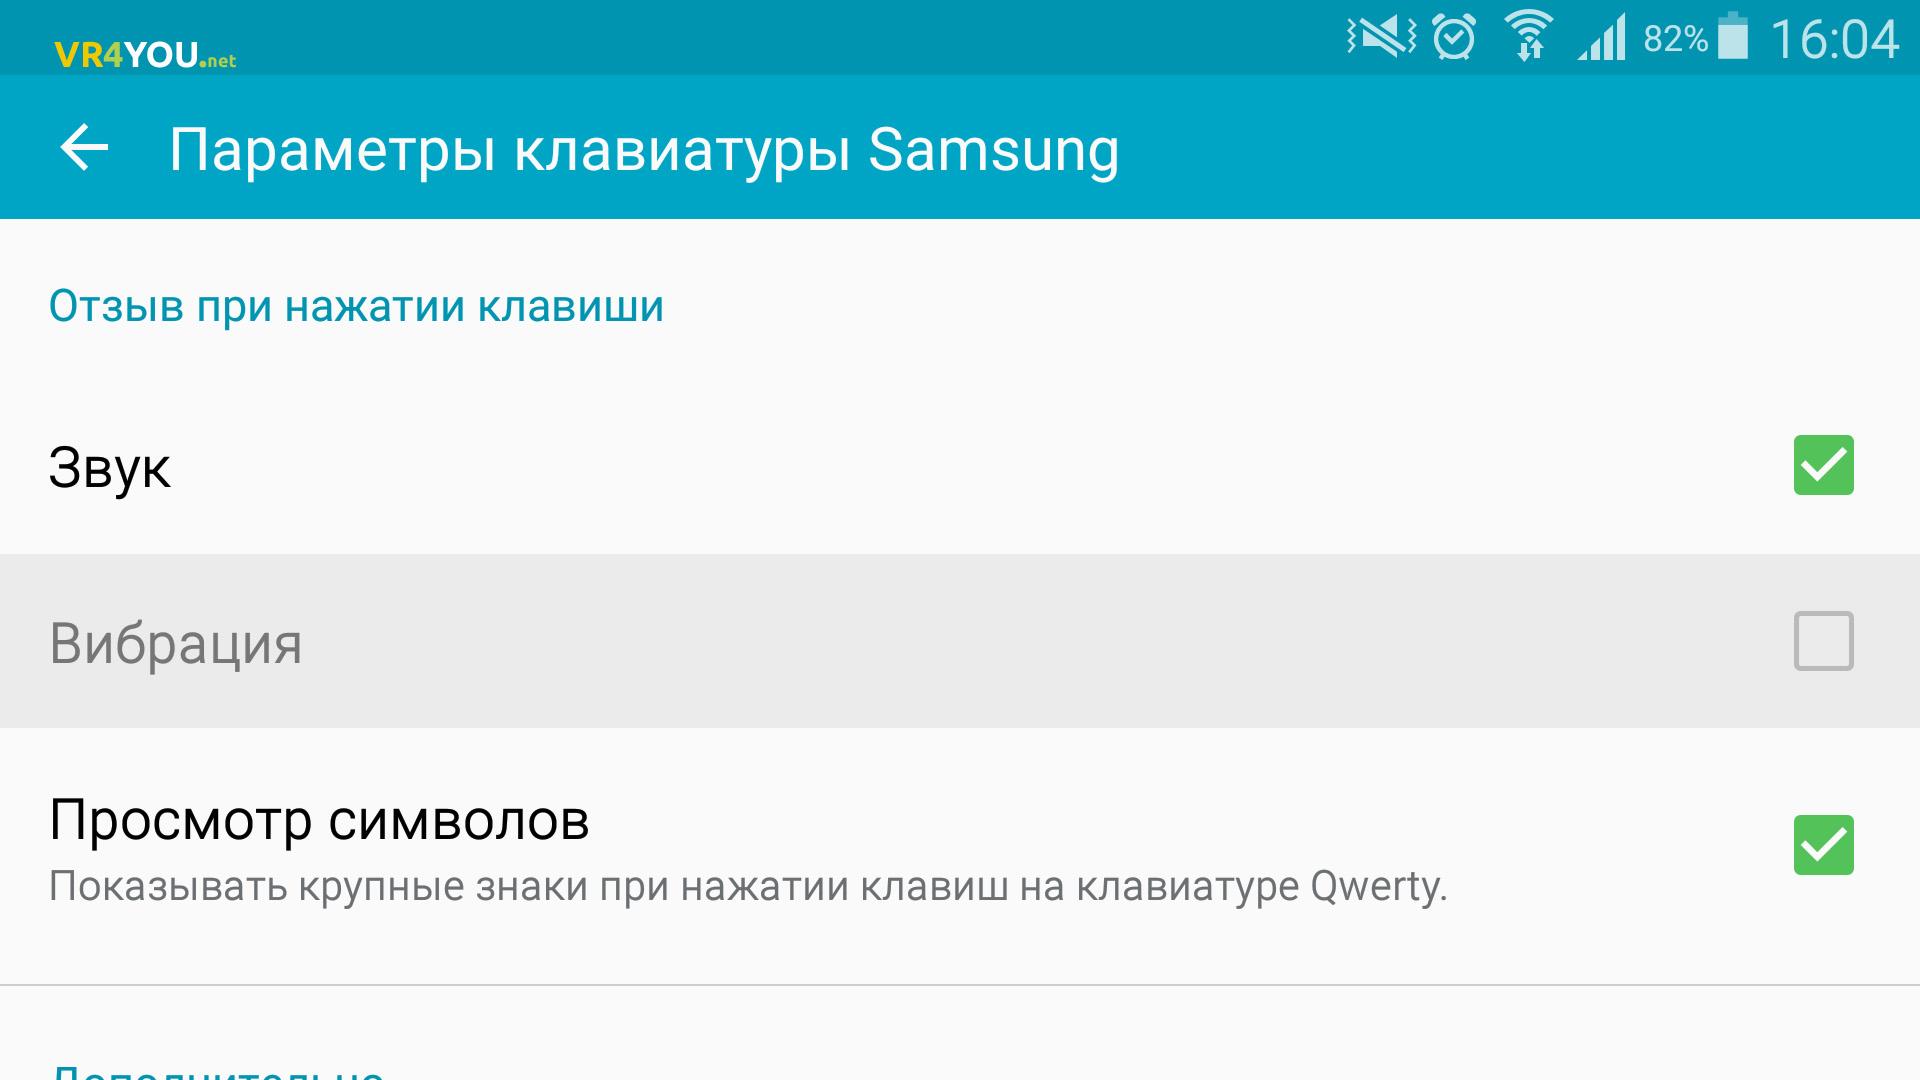 Отключение виброотклика на устройствах Android